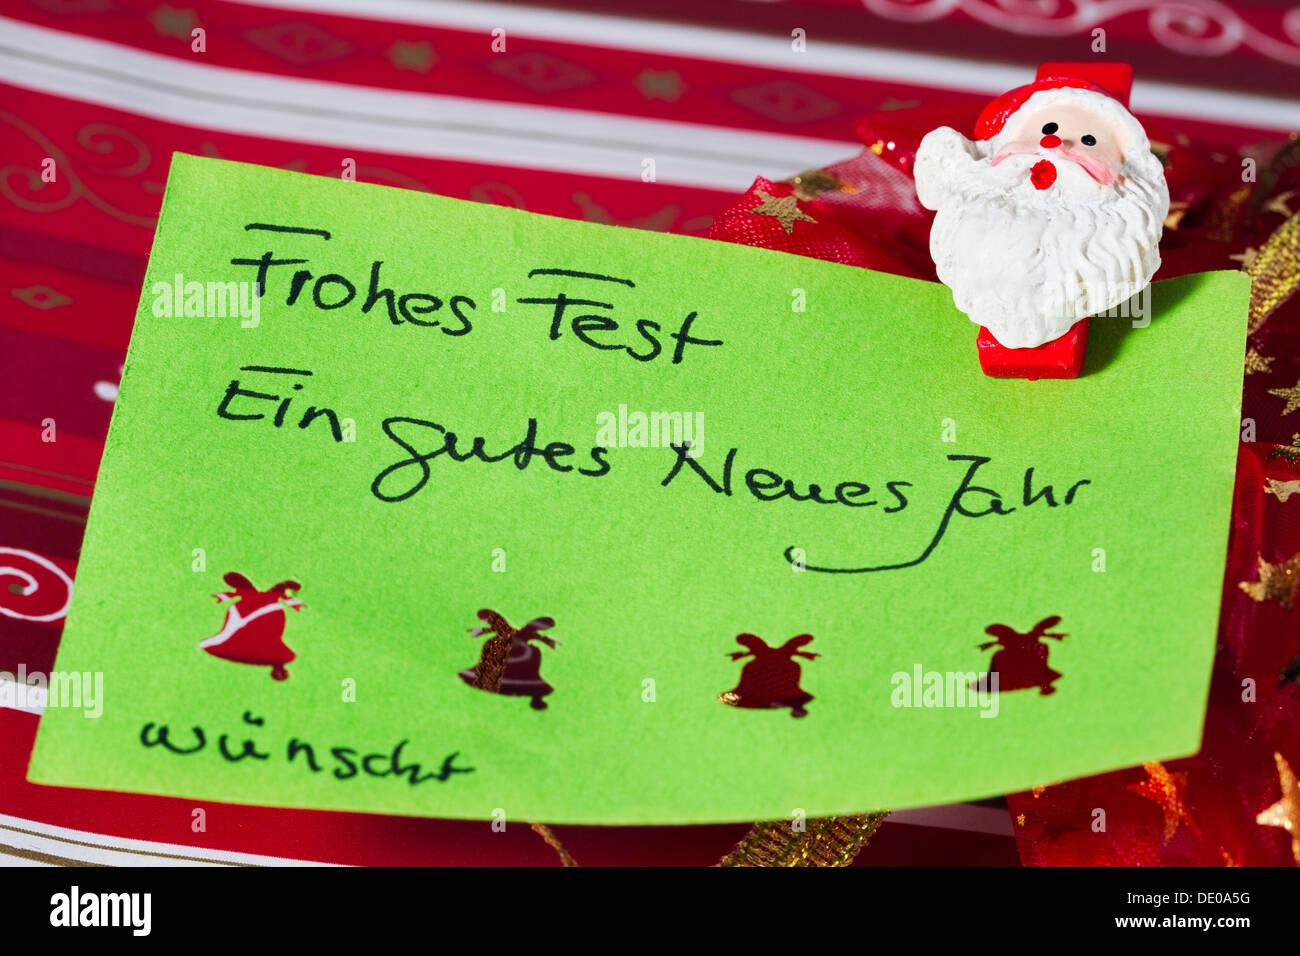 German new year greetings stock photos german new year greetings christmas greeting card frohes fest ein gutes neues jahr german for merry christmas kristyandbryce Images